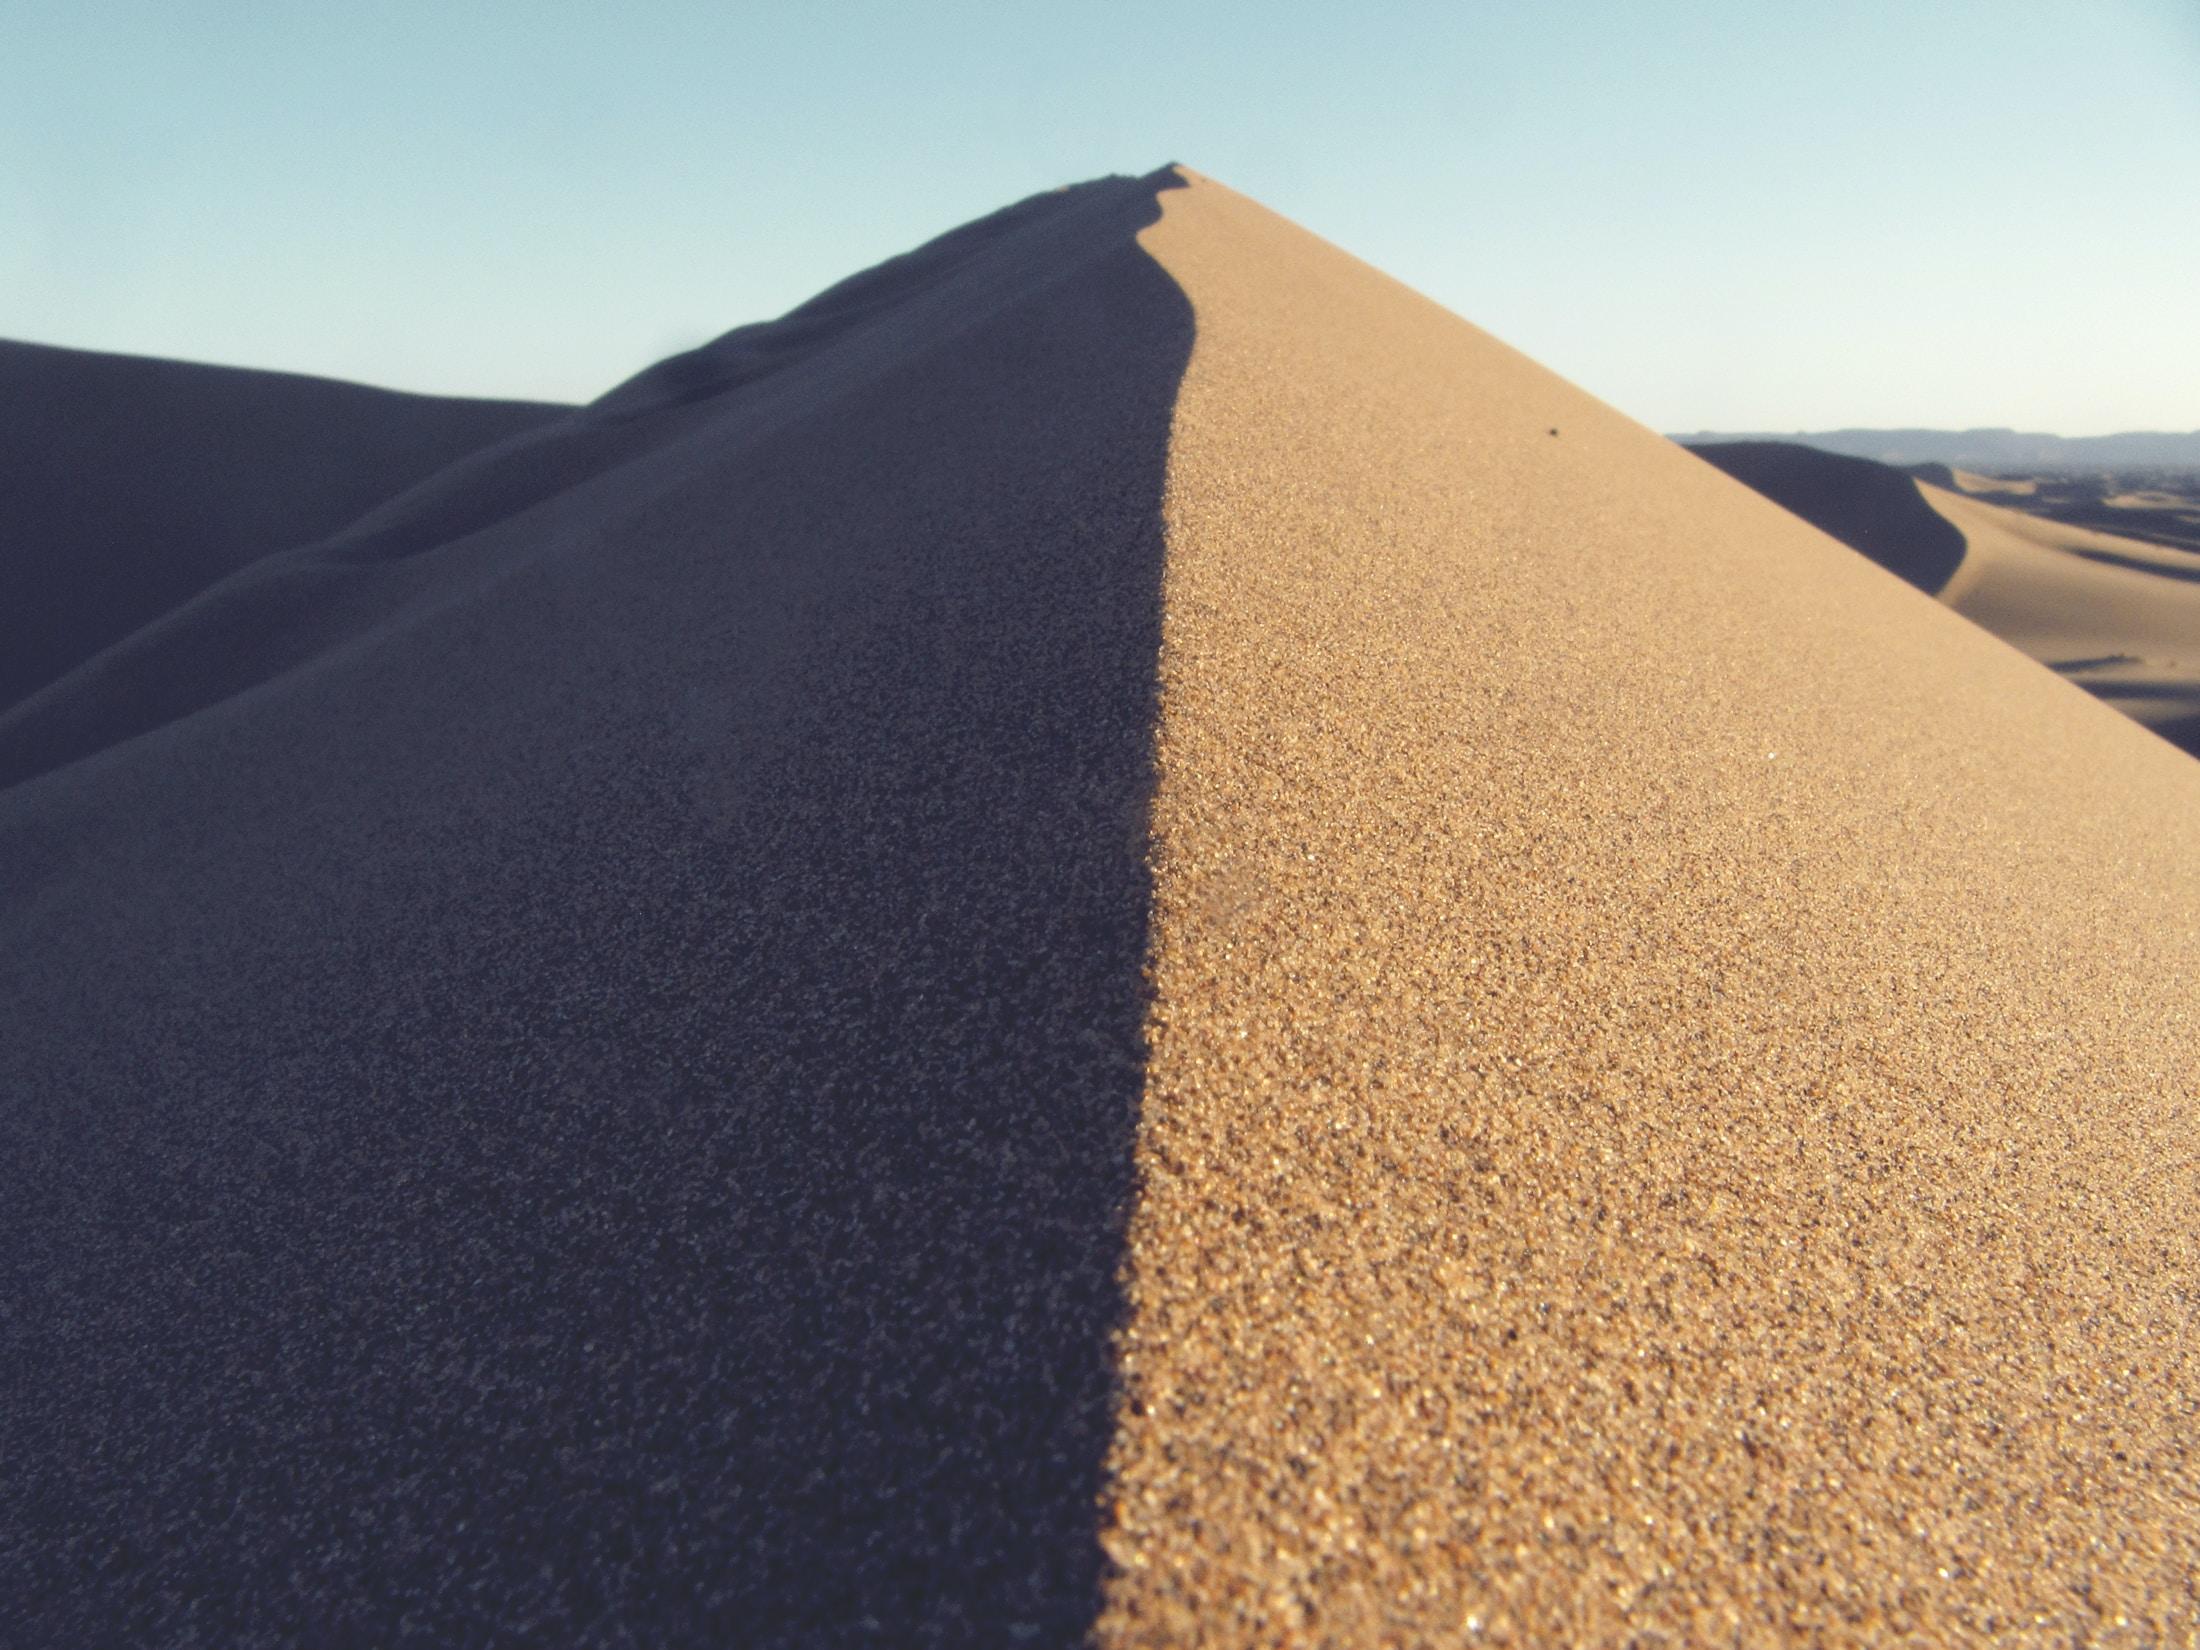 Sand dunes form a symmetrical ridge in the dry desert